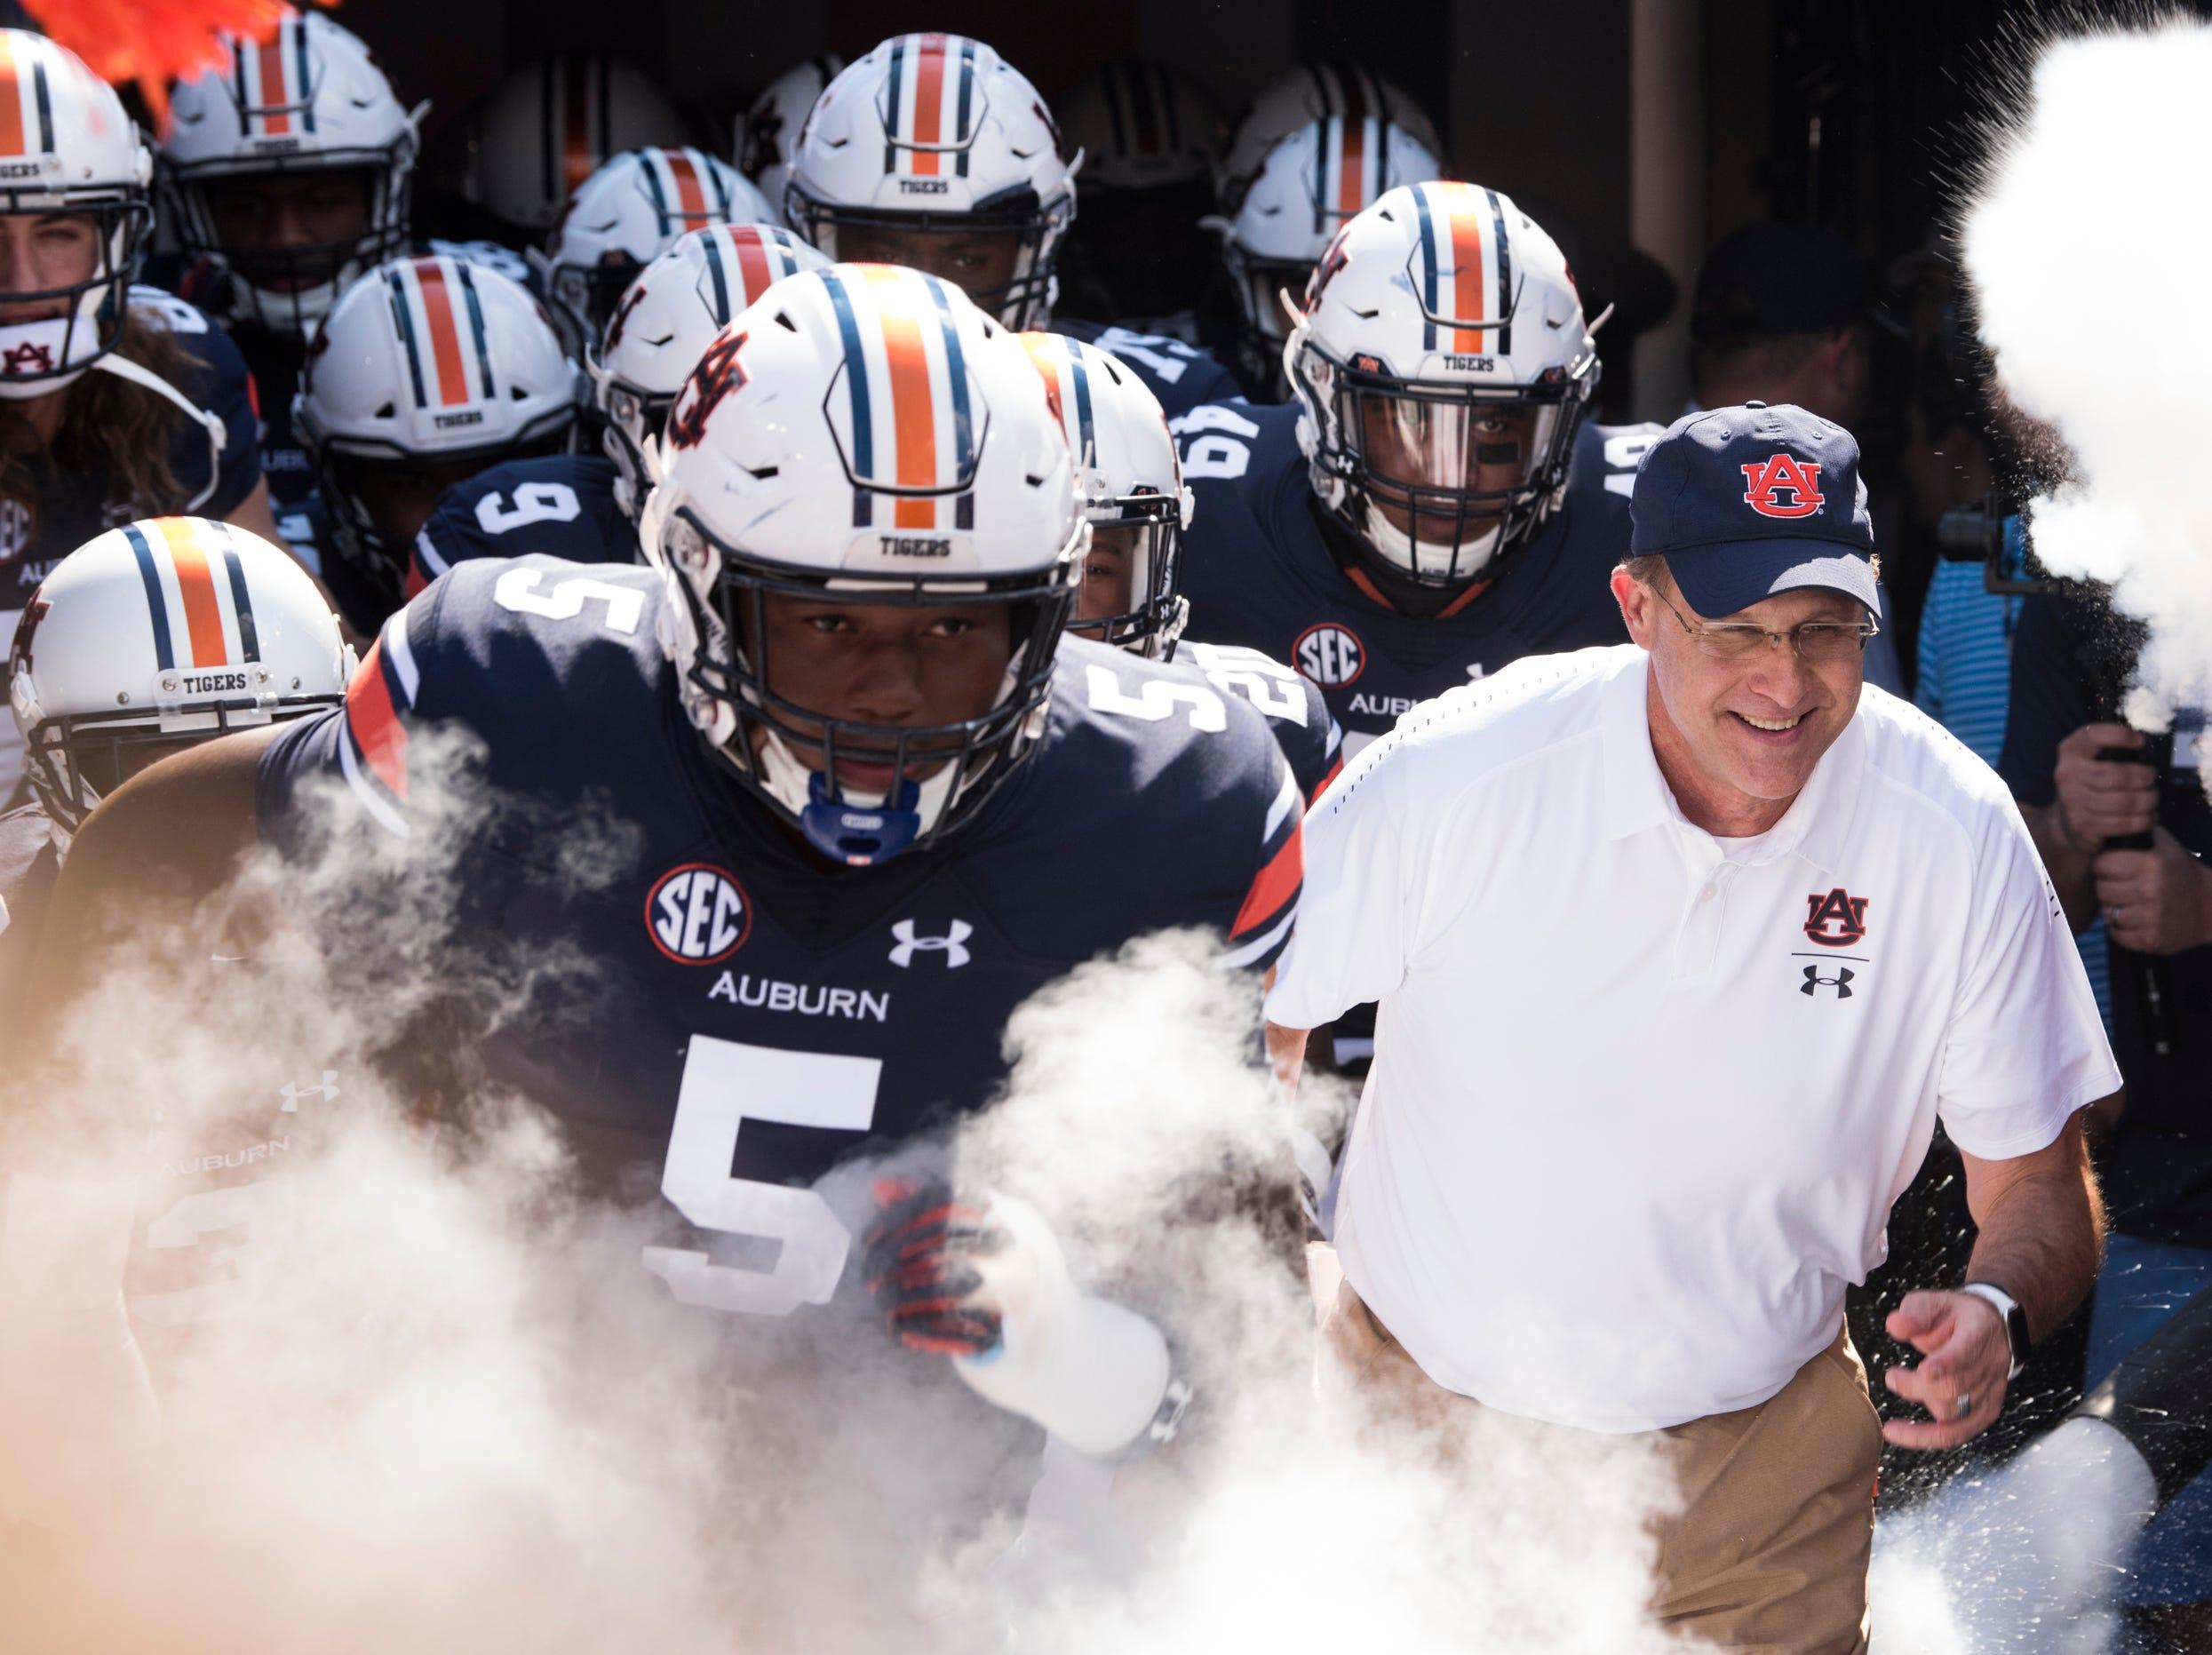 Auburn head coach Gus Malzahn leads his team out before taking on LSU at Jordan-Hare Stadium in Auburn, Ala., on Saturday, Sept. 15, 2018. LSU defeated Auburn 22-21.